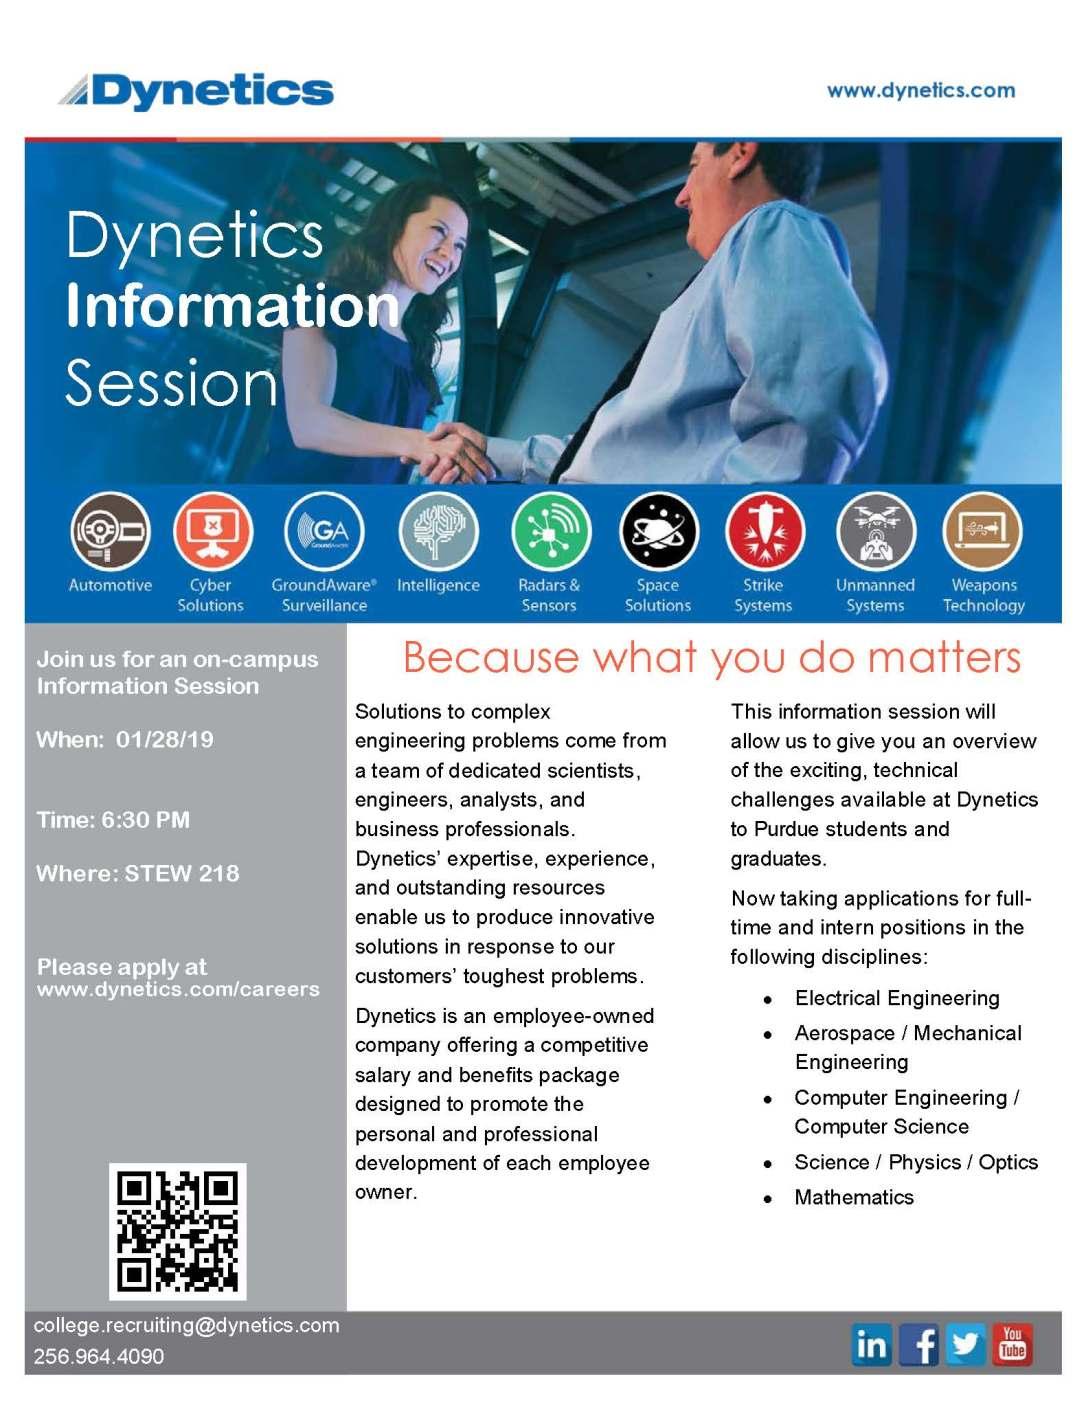 DyneticsInfoSession